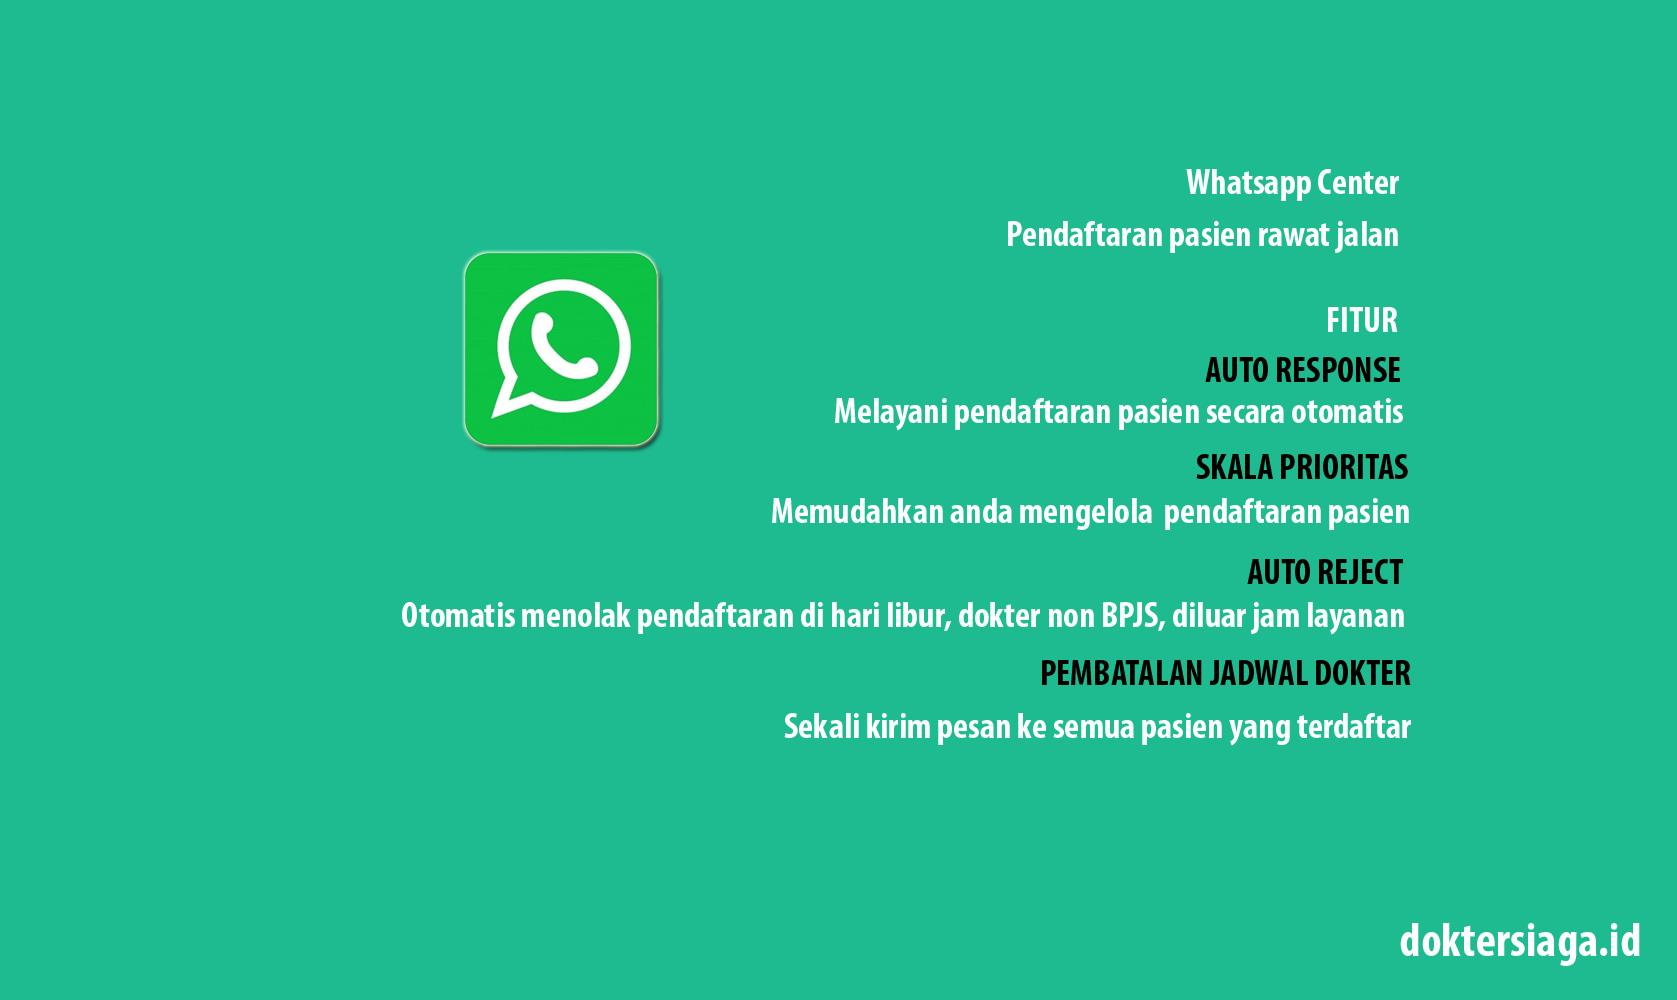 Whatsapp Center Pendaftran Pasien